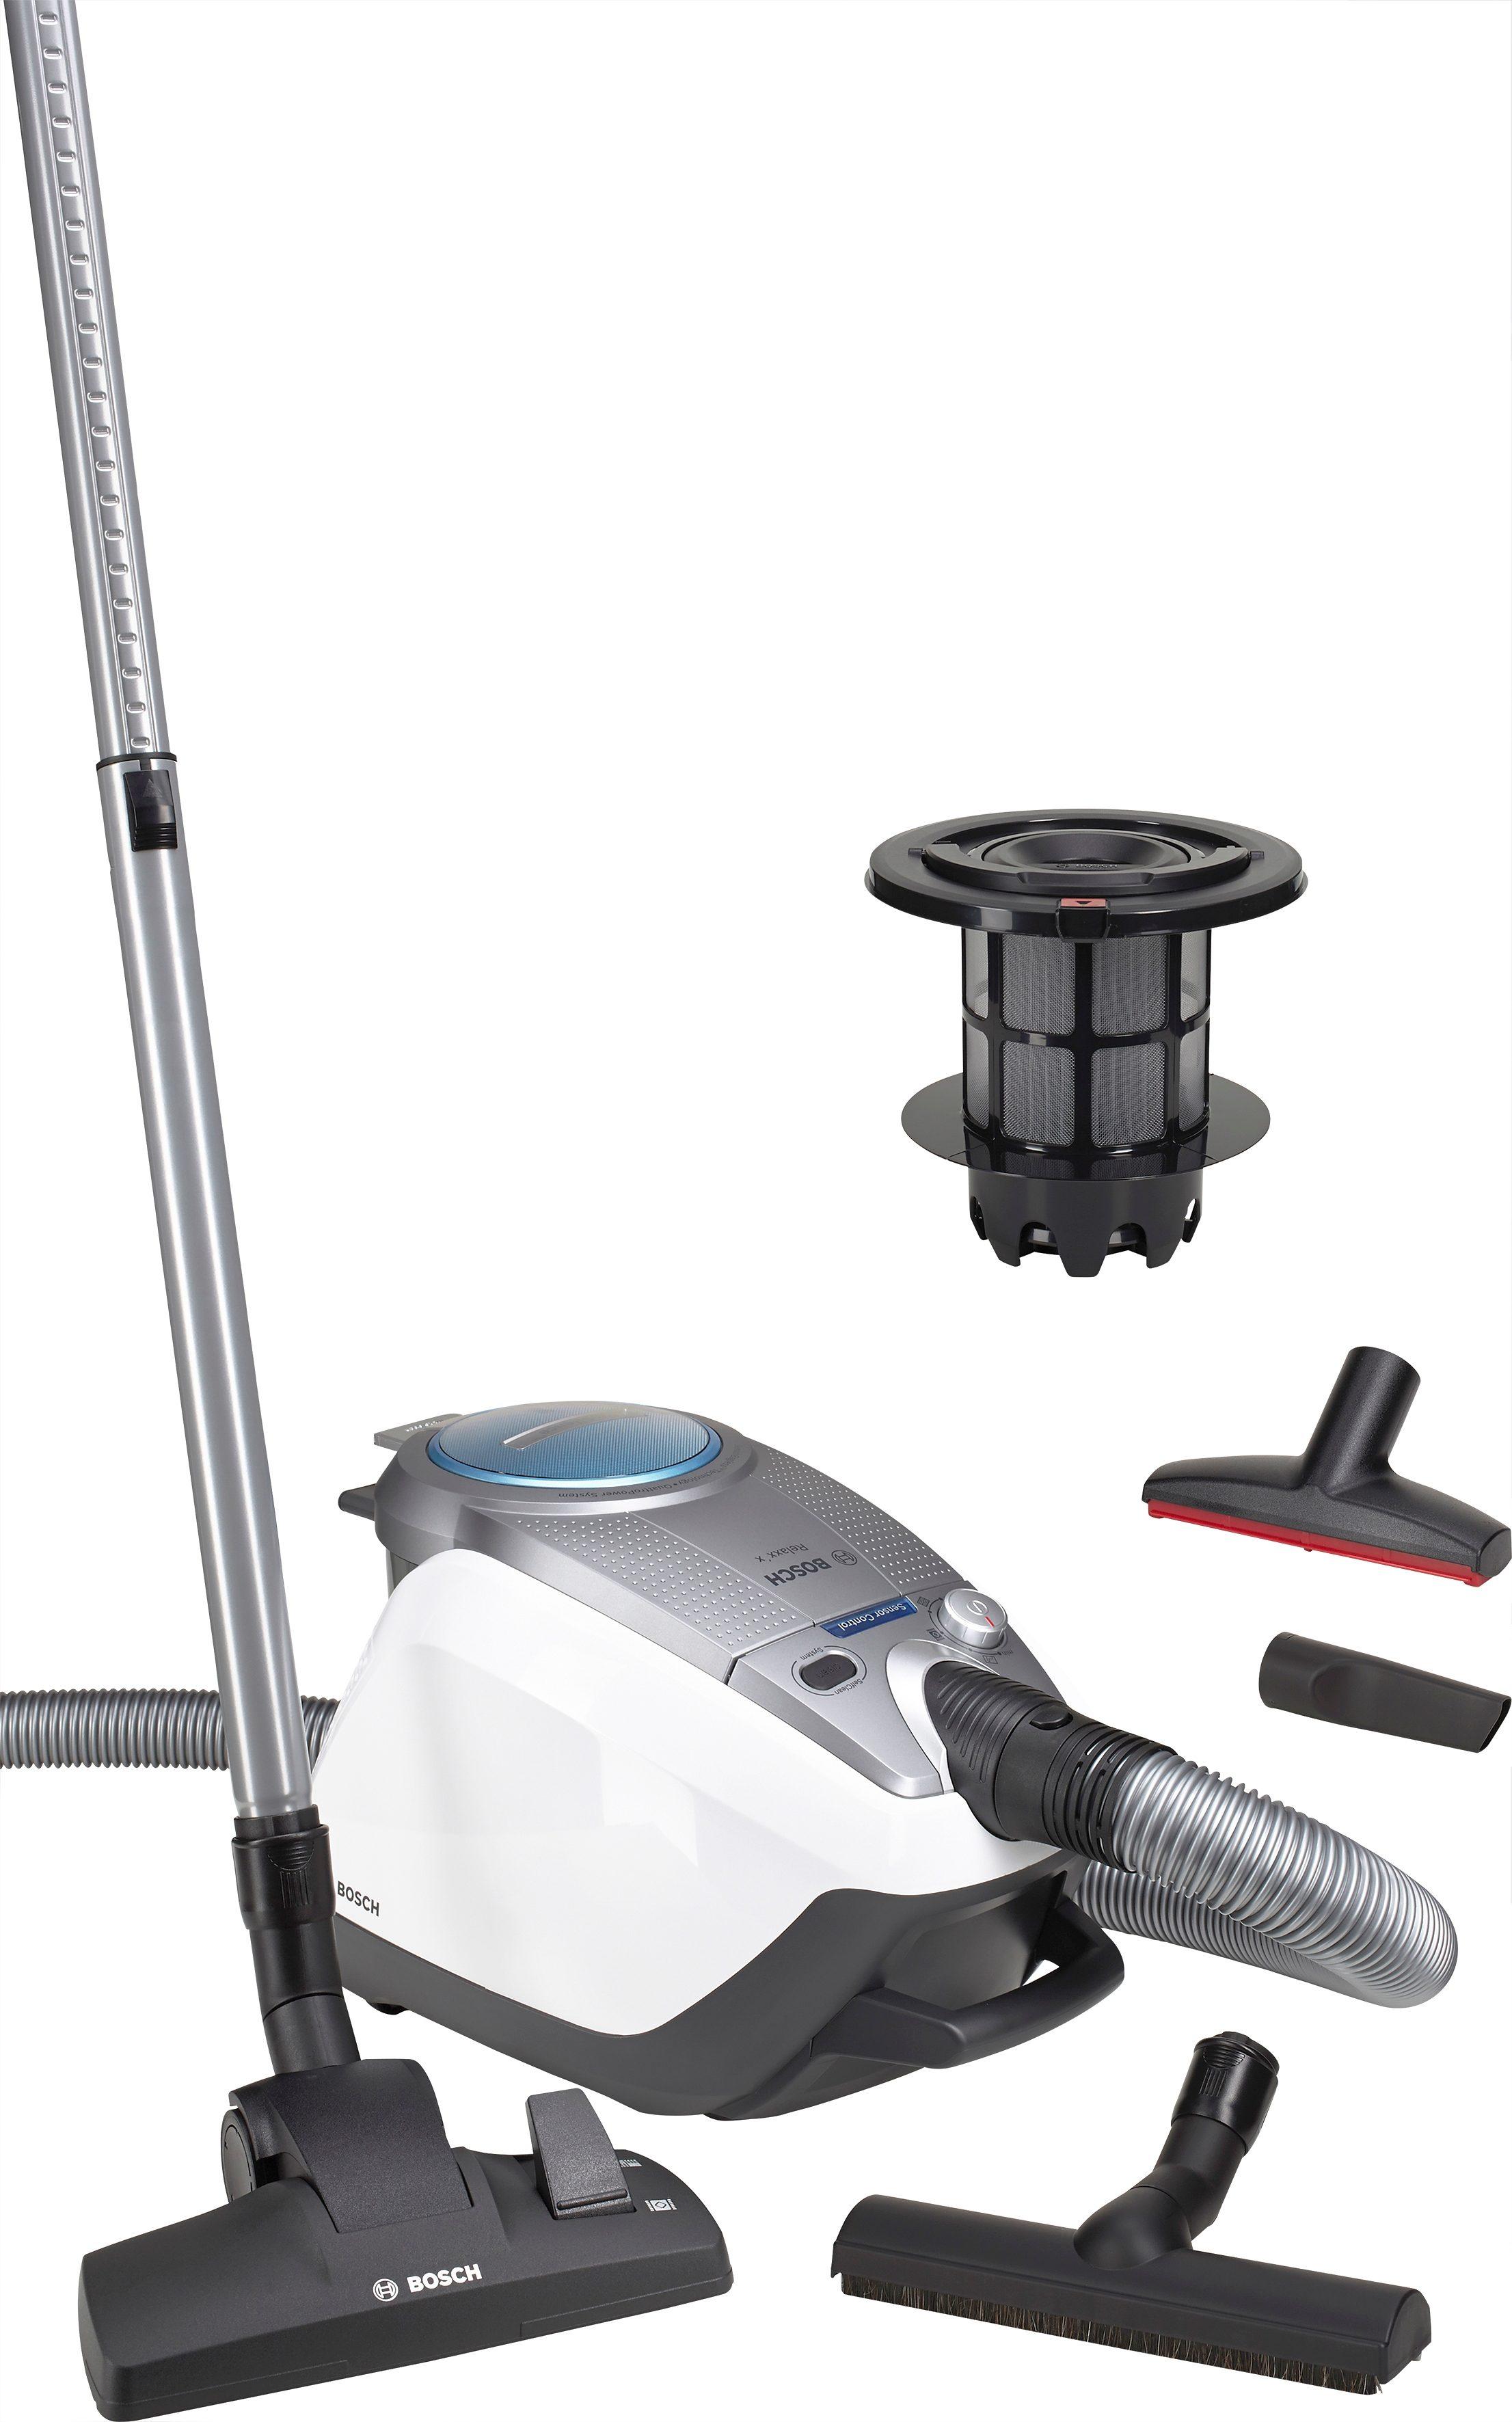 Bosch Bodenstaubsauger Relaxx'x ProSilence Plus BGS5331, beutellos, Energieklasse A, weiß